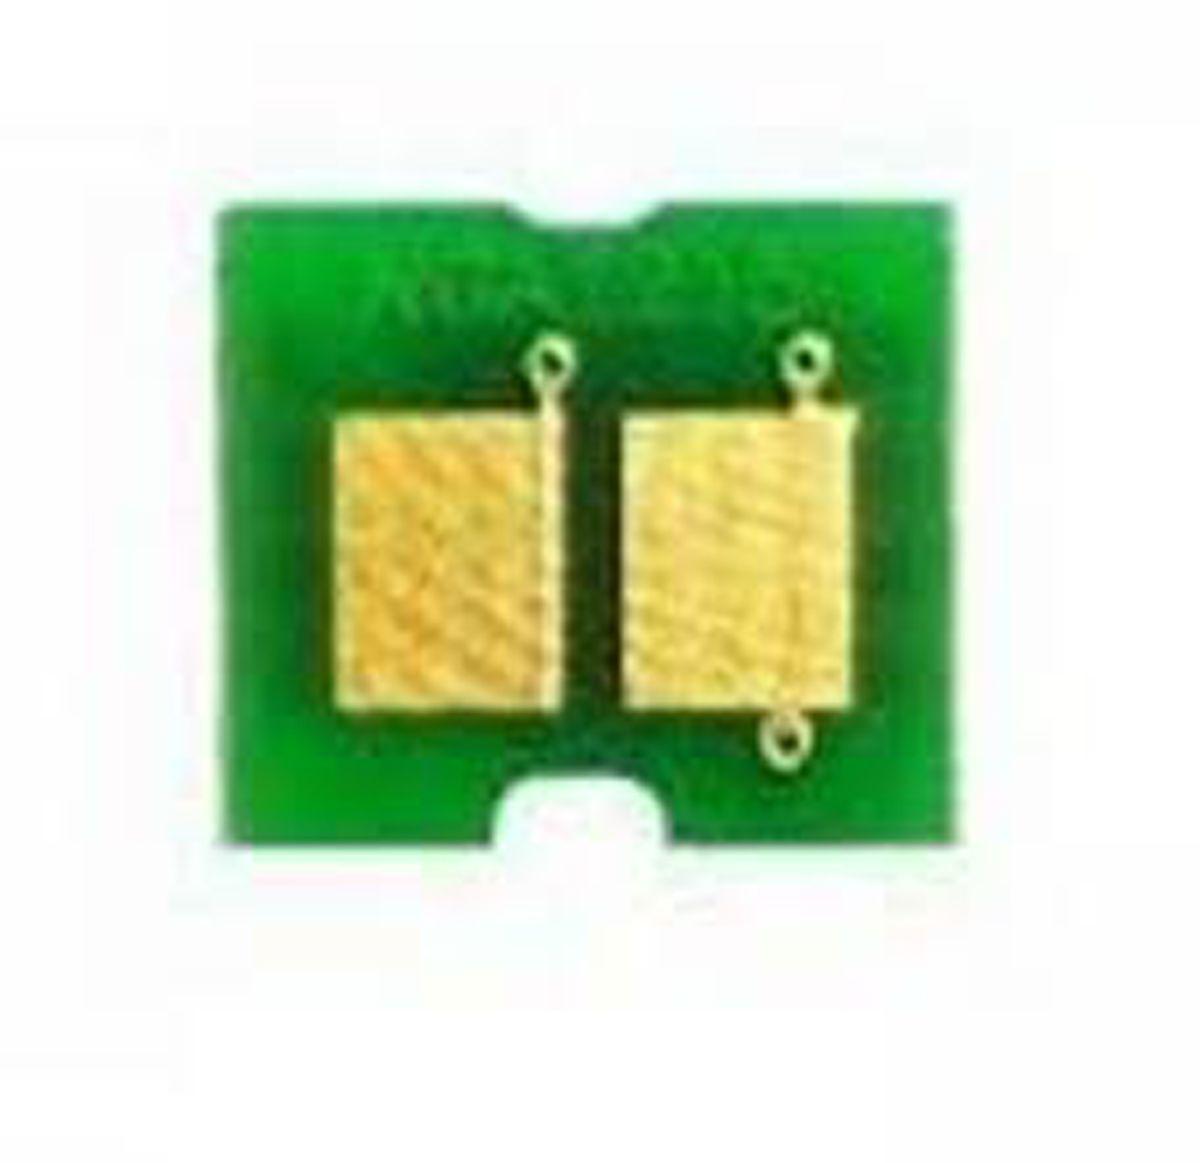 Chip HP CB540 CE410 CC530 CE310 CF210 CE320 CE400 380 CE250 - TRK/C1 - Preto - CP1215 CP1515 1215 1515